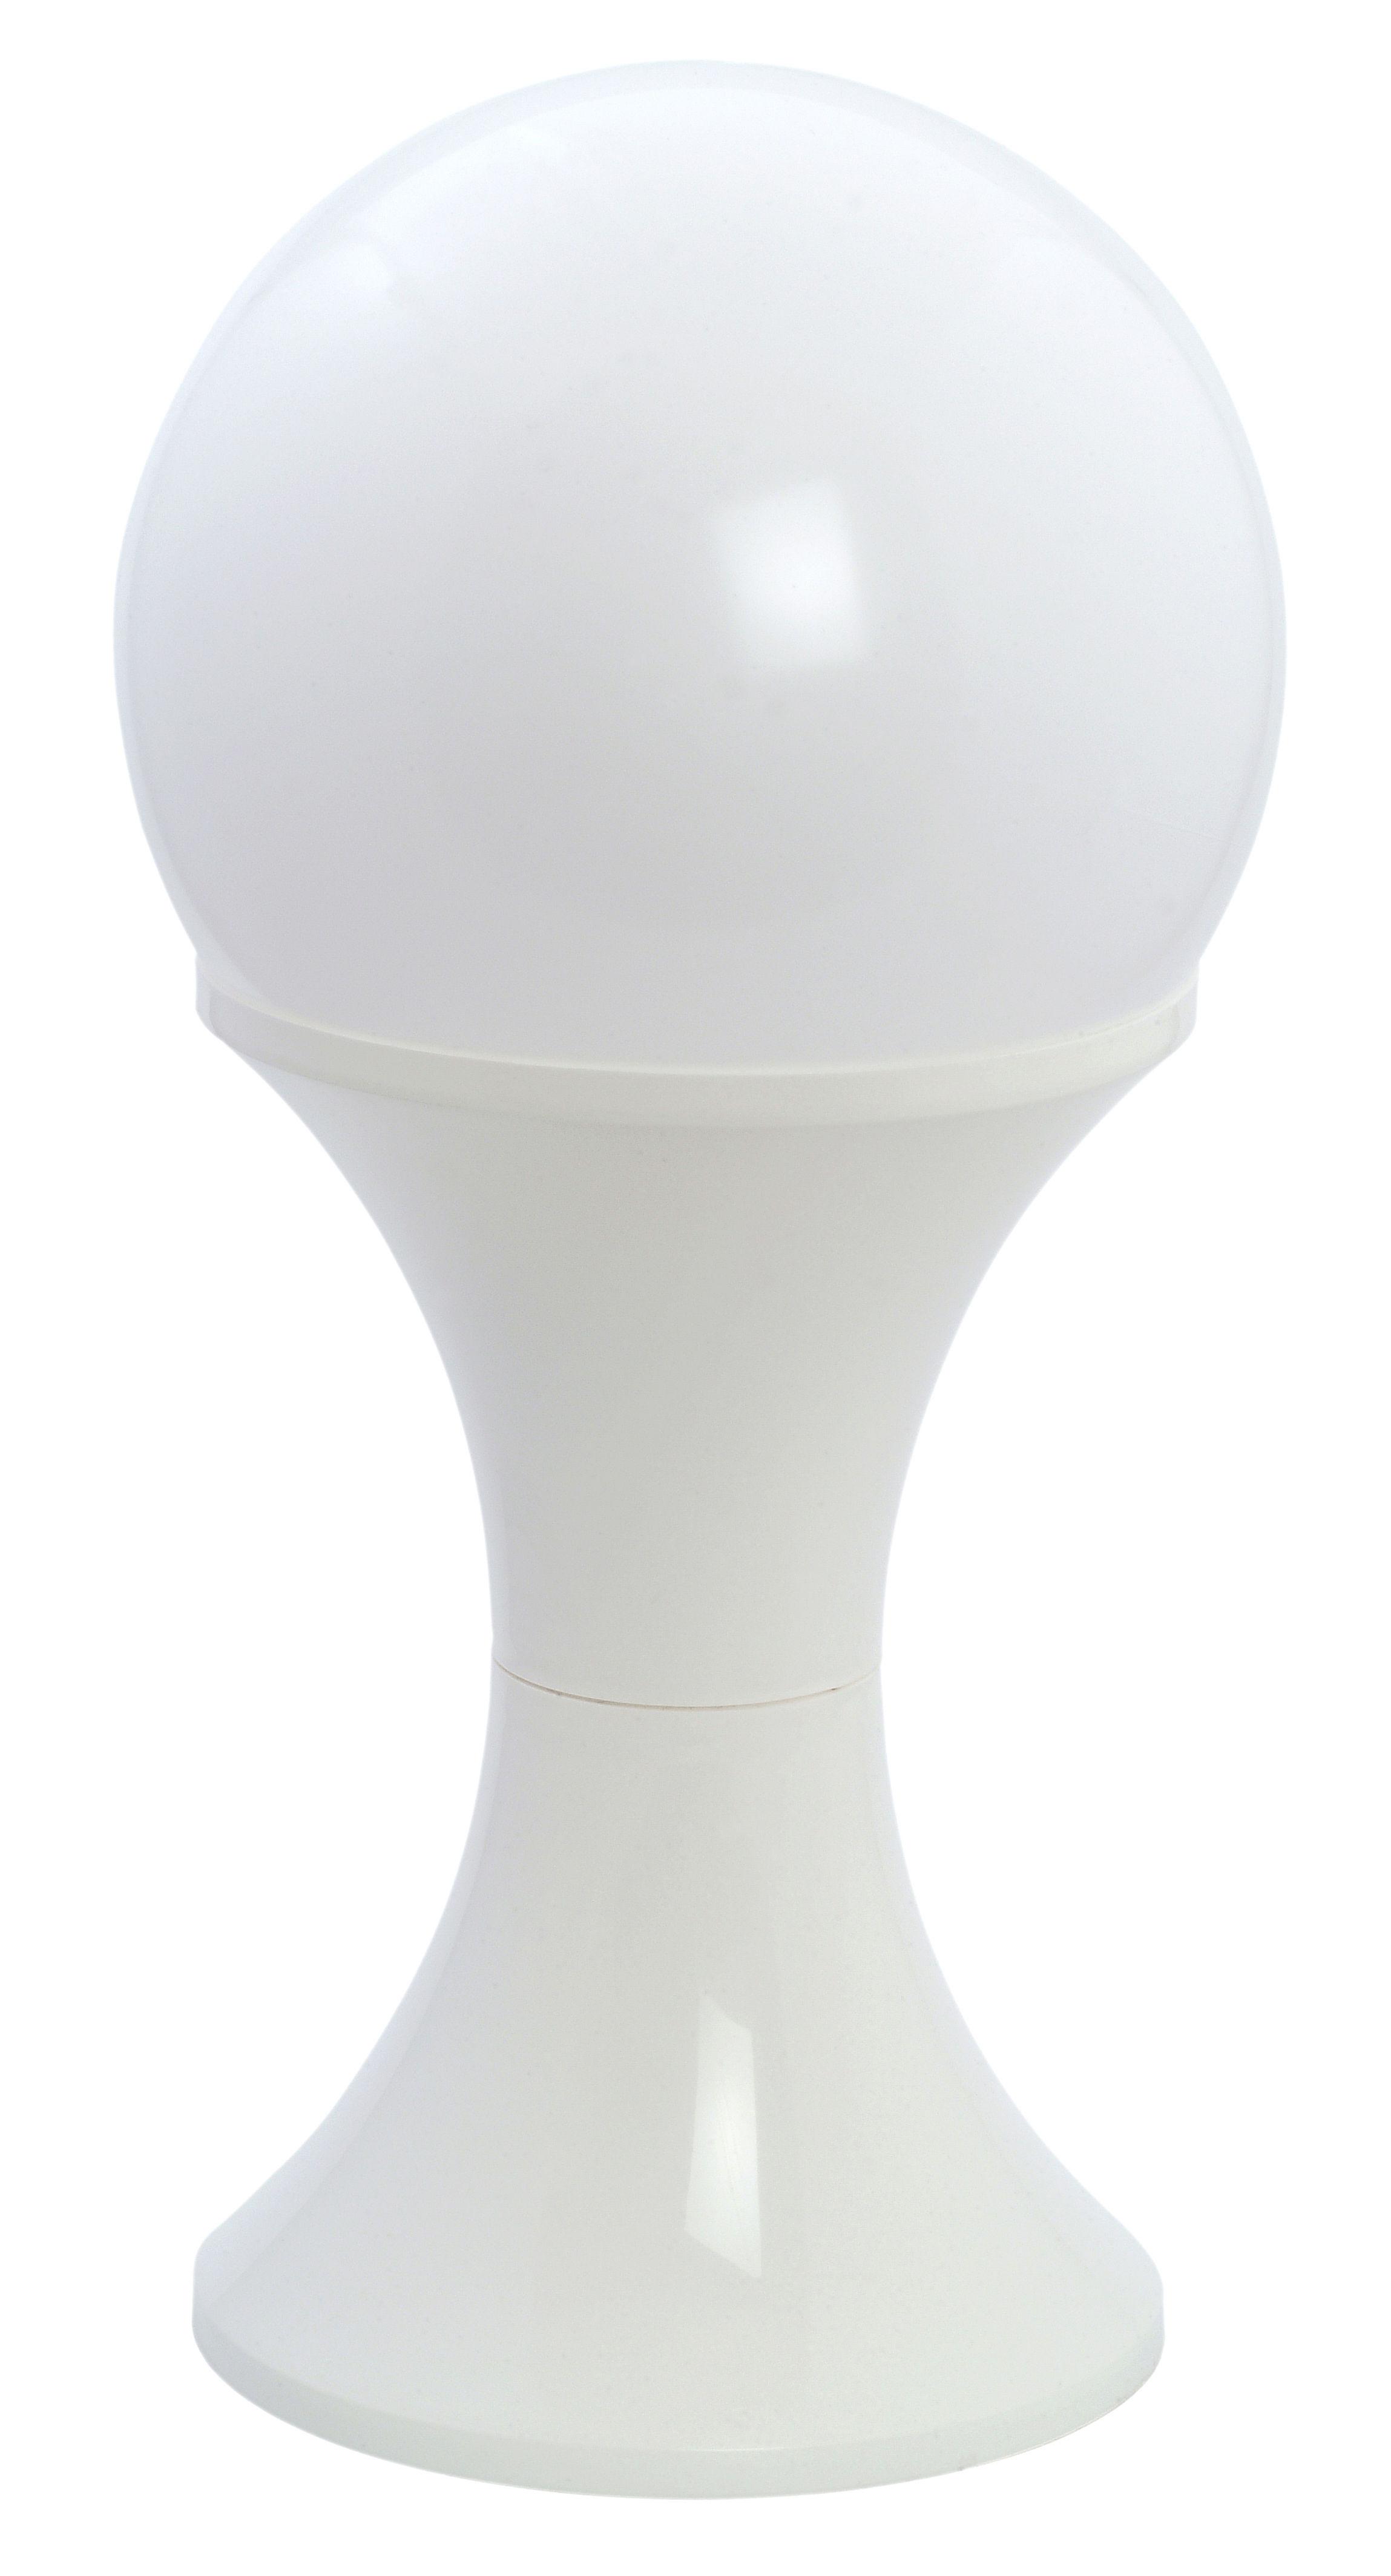 Scopri lampada da pavimento tam tam lampe bianca di branex design made in design italia - Kruk tam tam henry massonnet ...